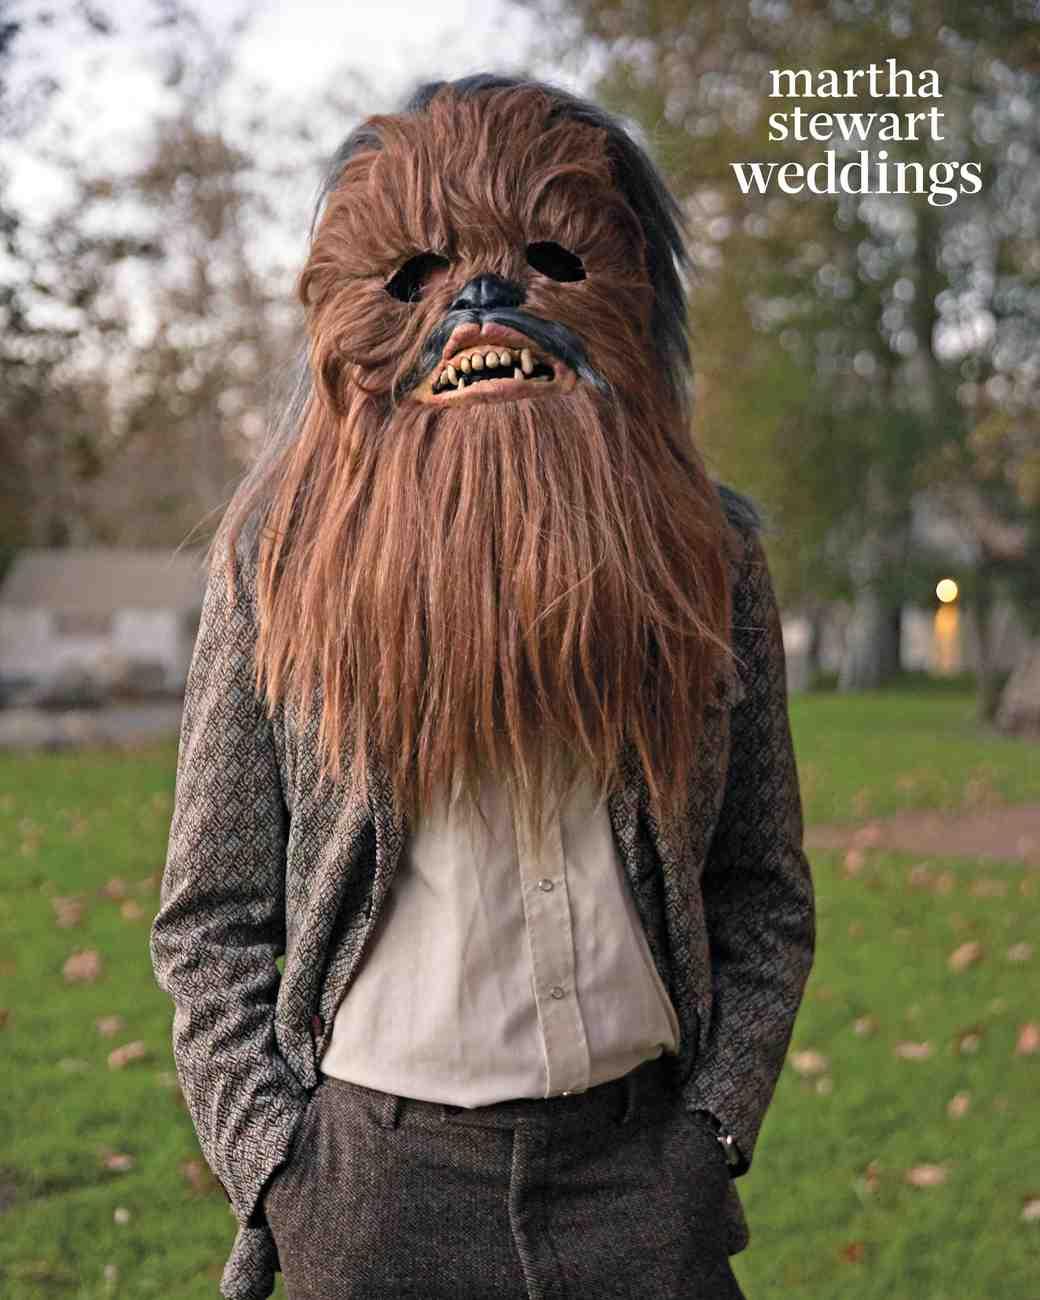 jamie-bryan-wedding-11-costume-party-0505-d112664.jpg